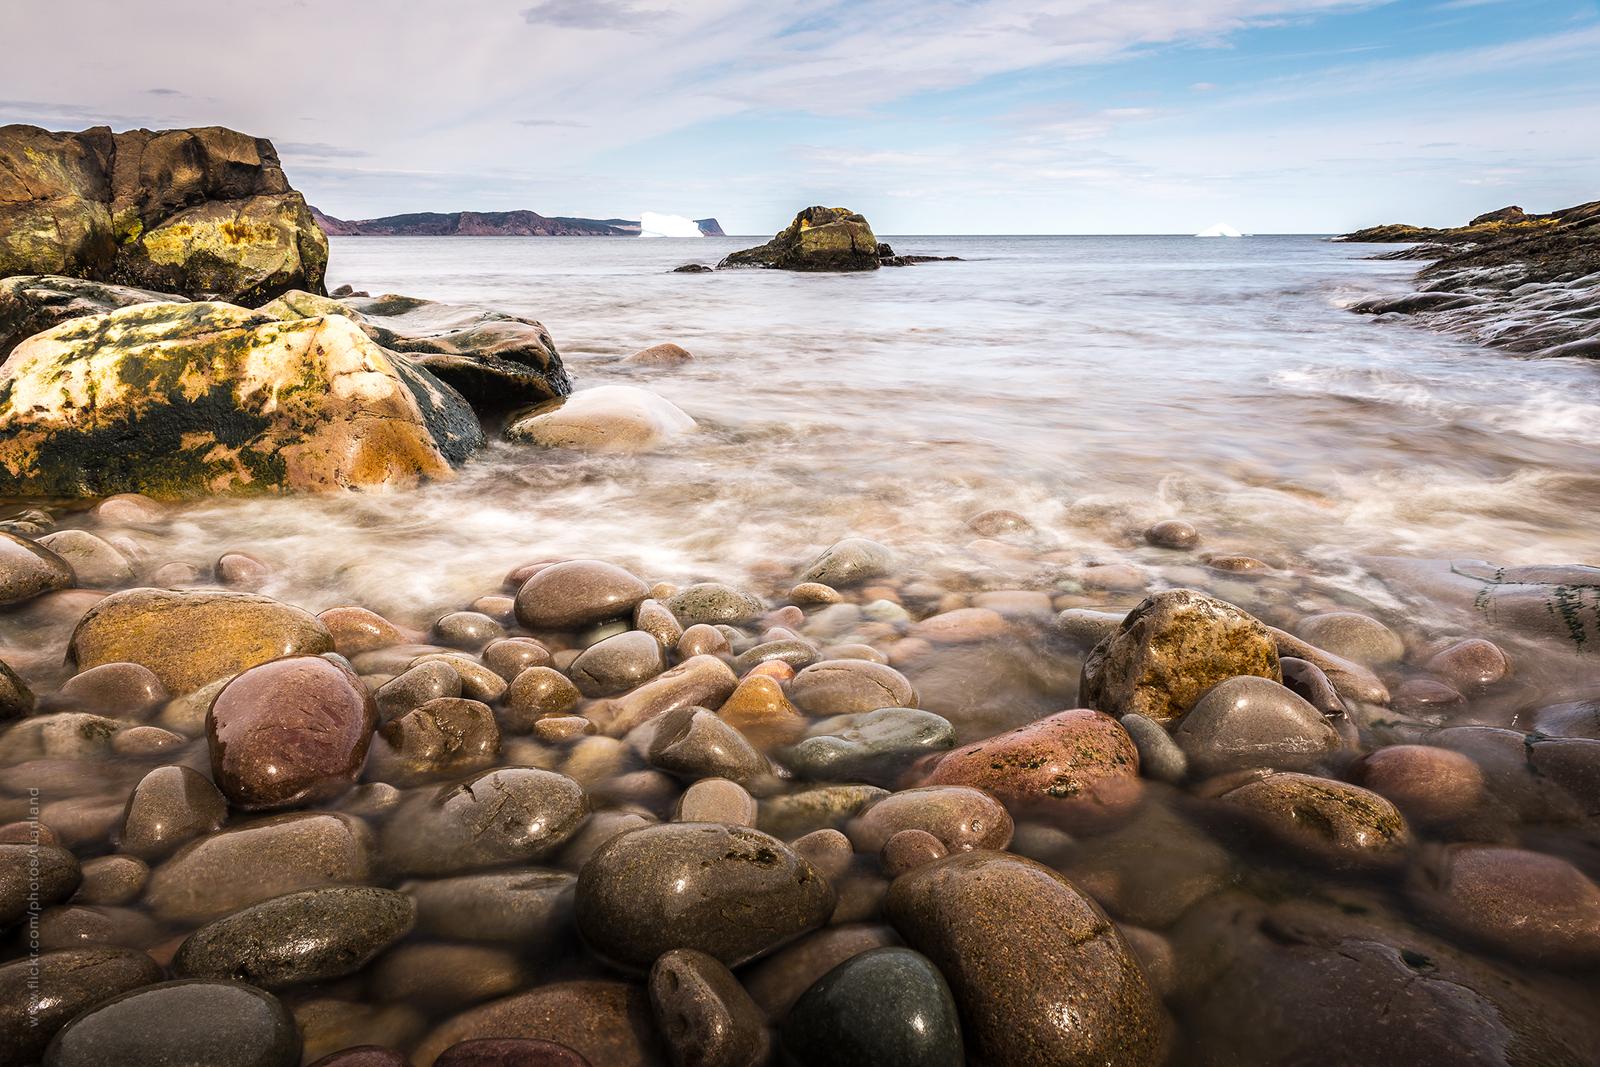 Playa de Newfoundland - 1600x1067